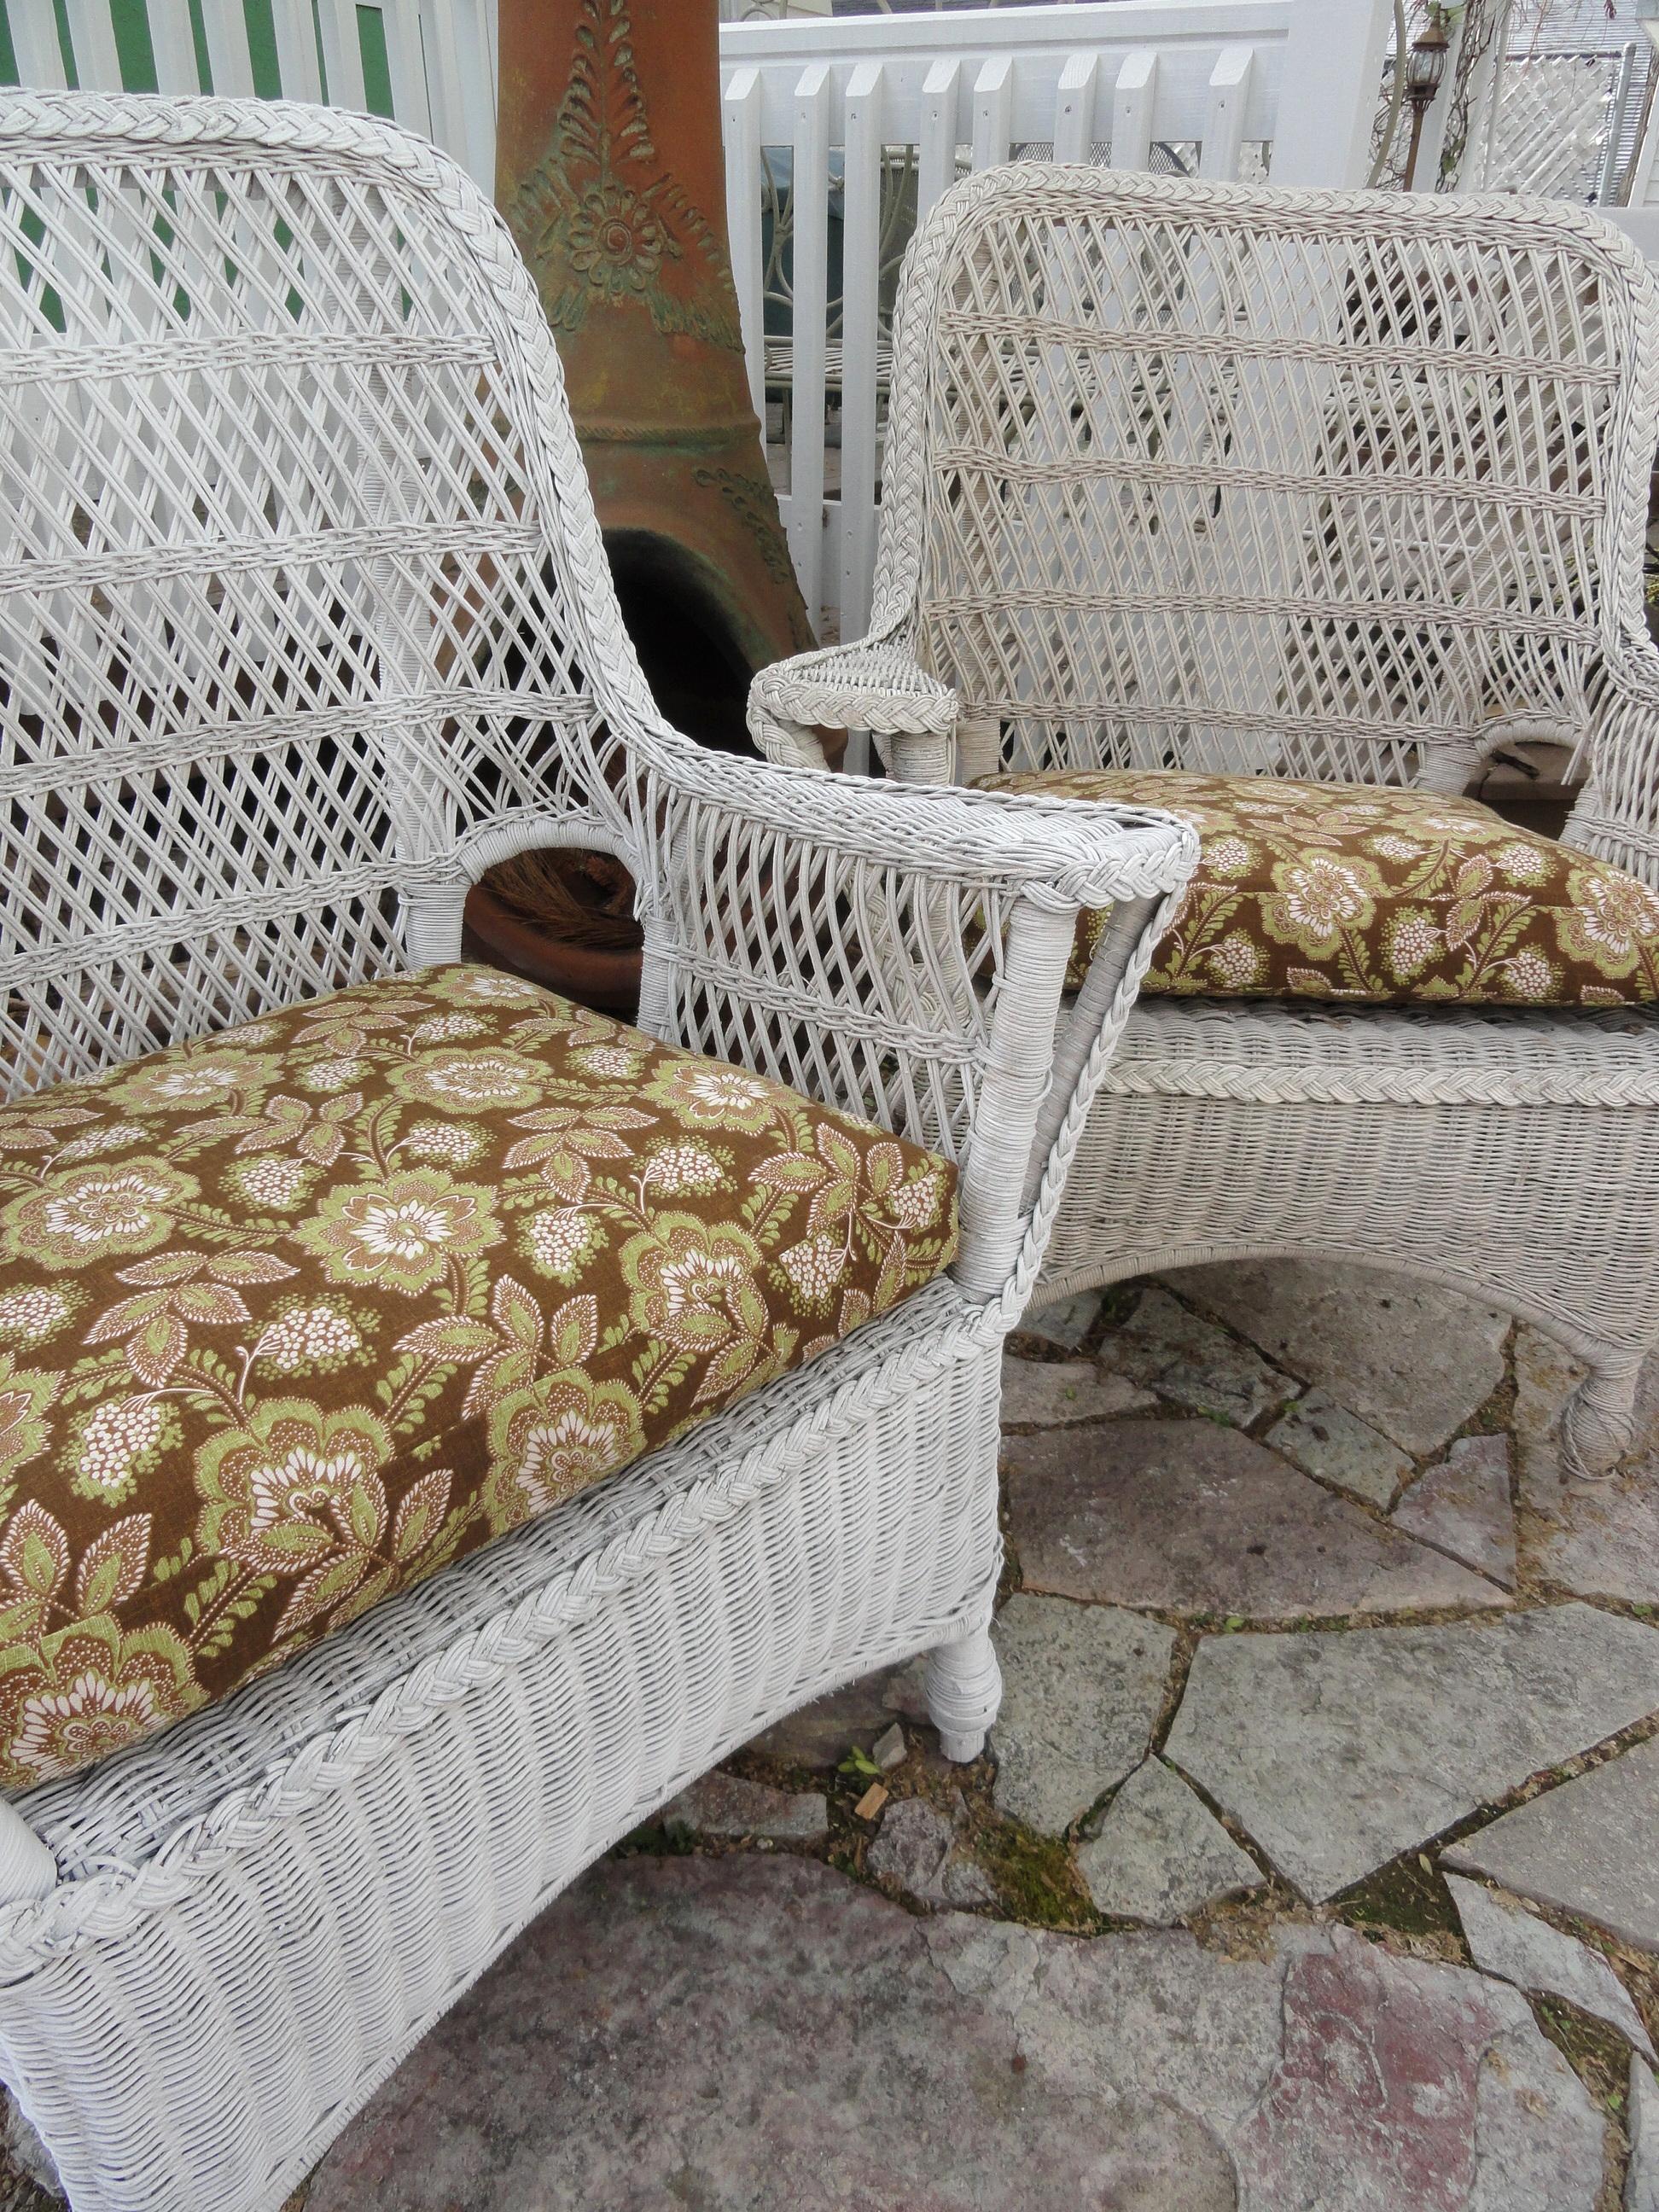 My Old Wicker Patio Chairs » My Pier 1 Wicker Chairsu2013